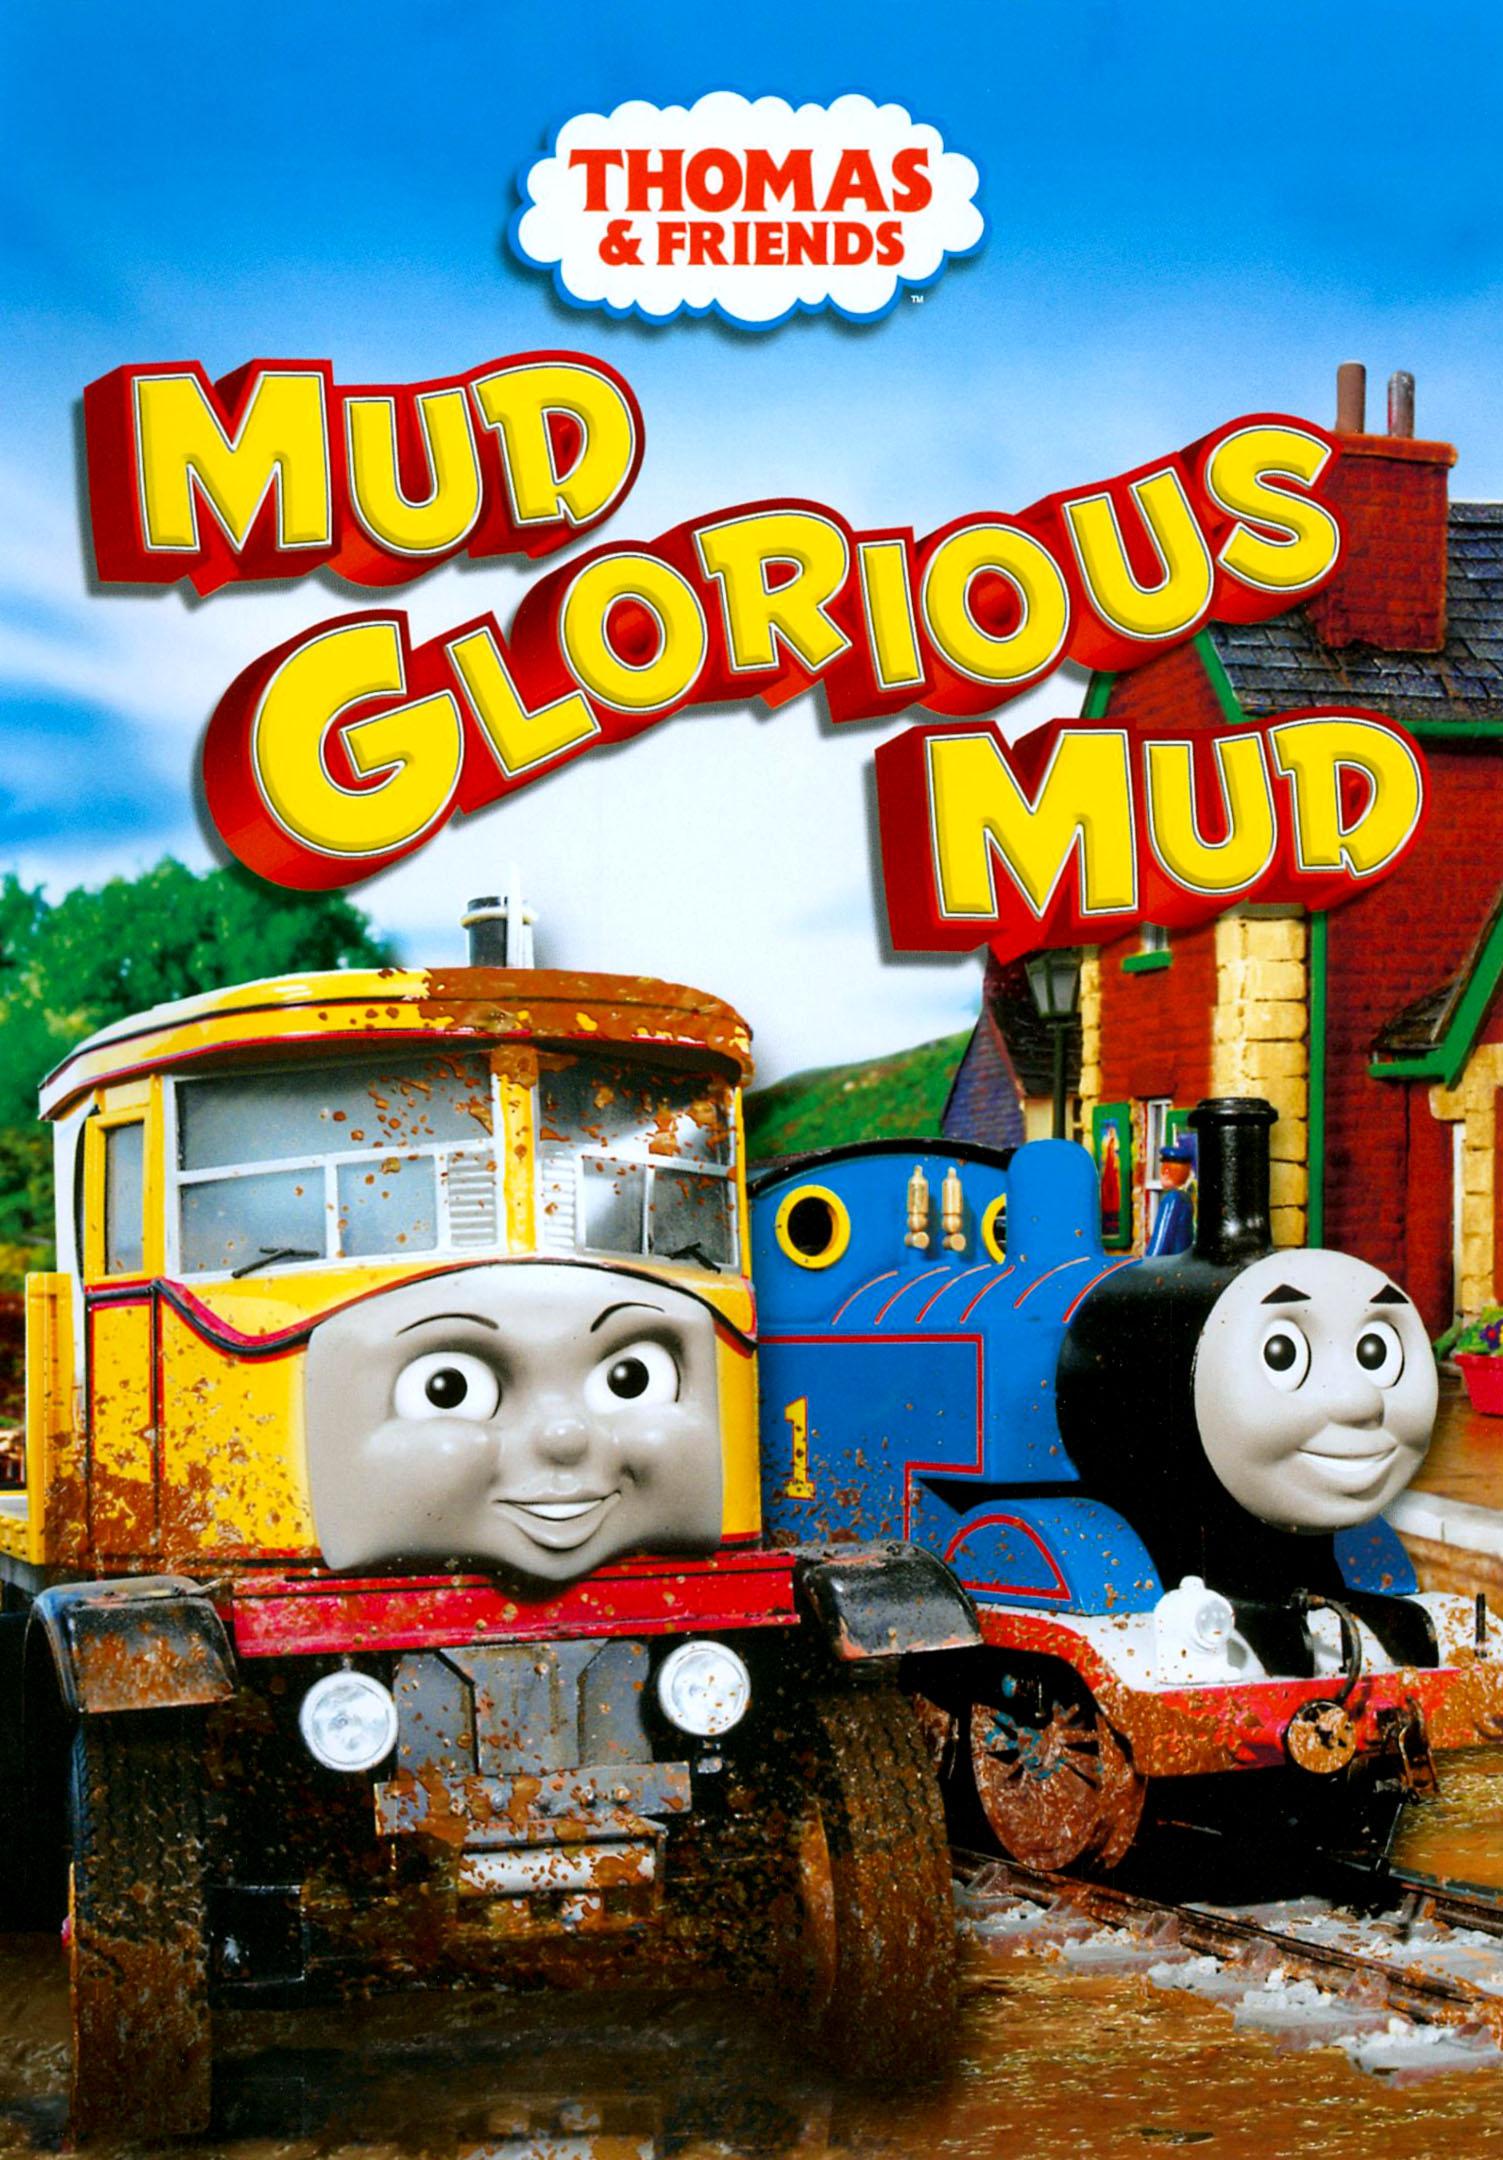 File:MudGloriousMudDVD.jpg